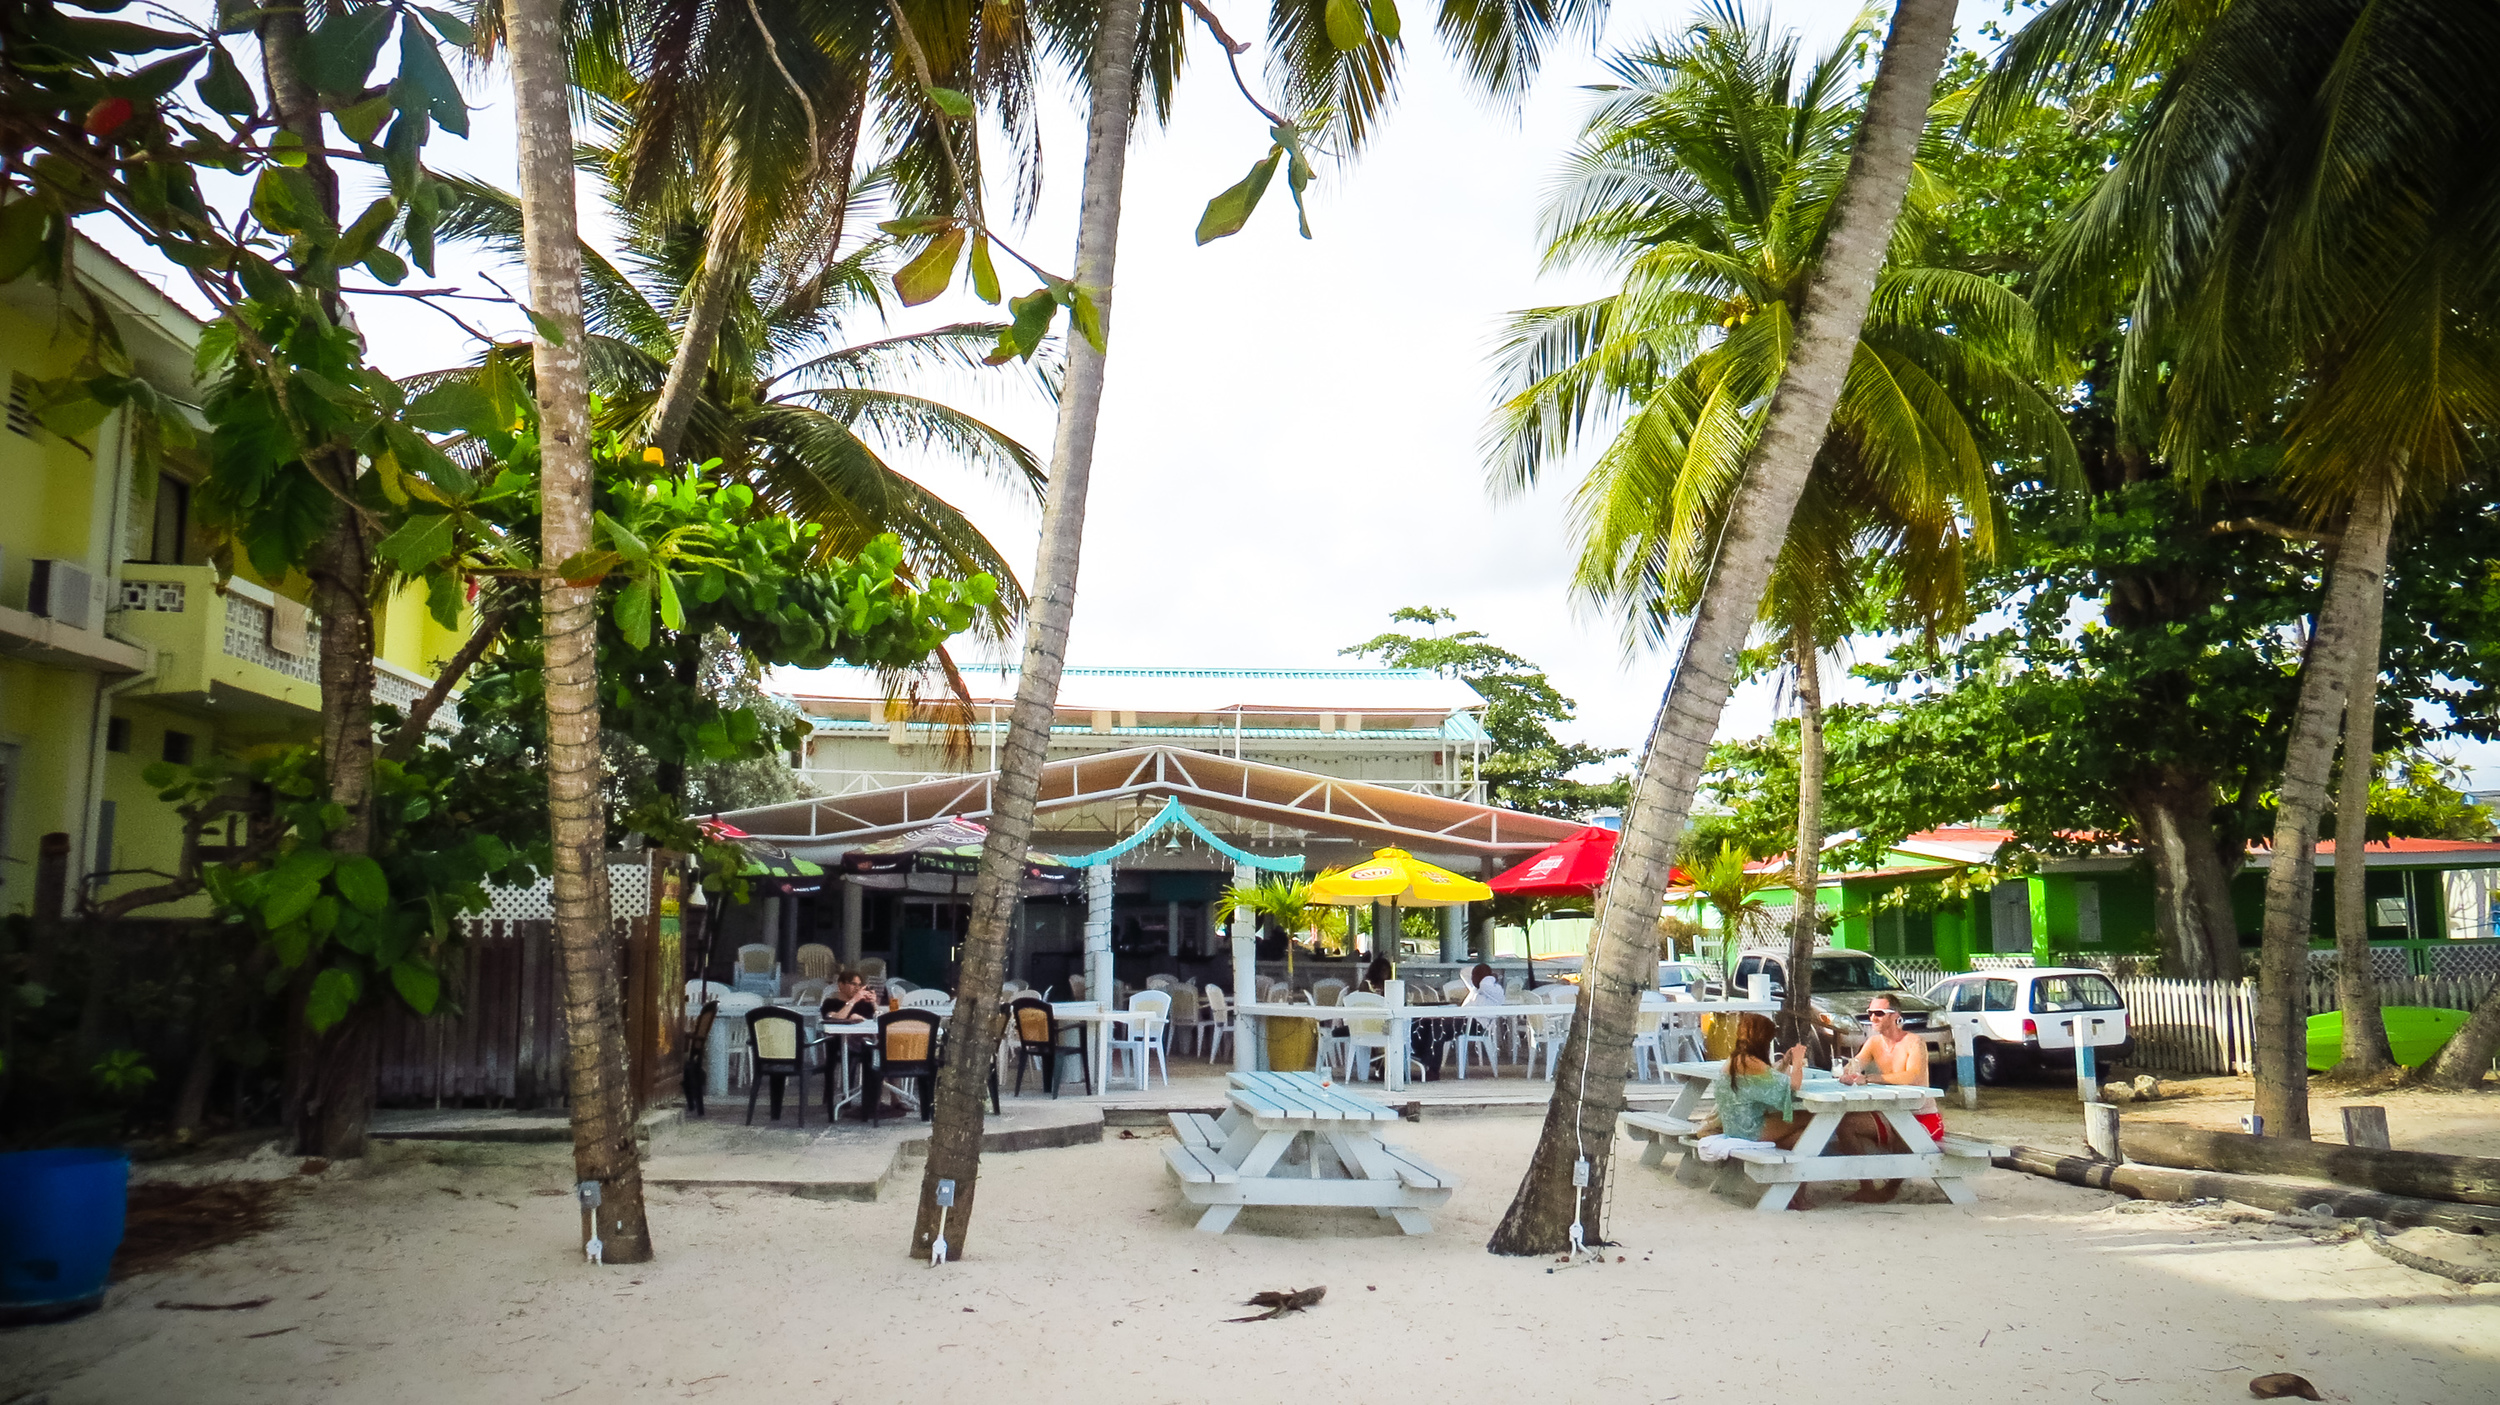 The Carib Beach Bar